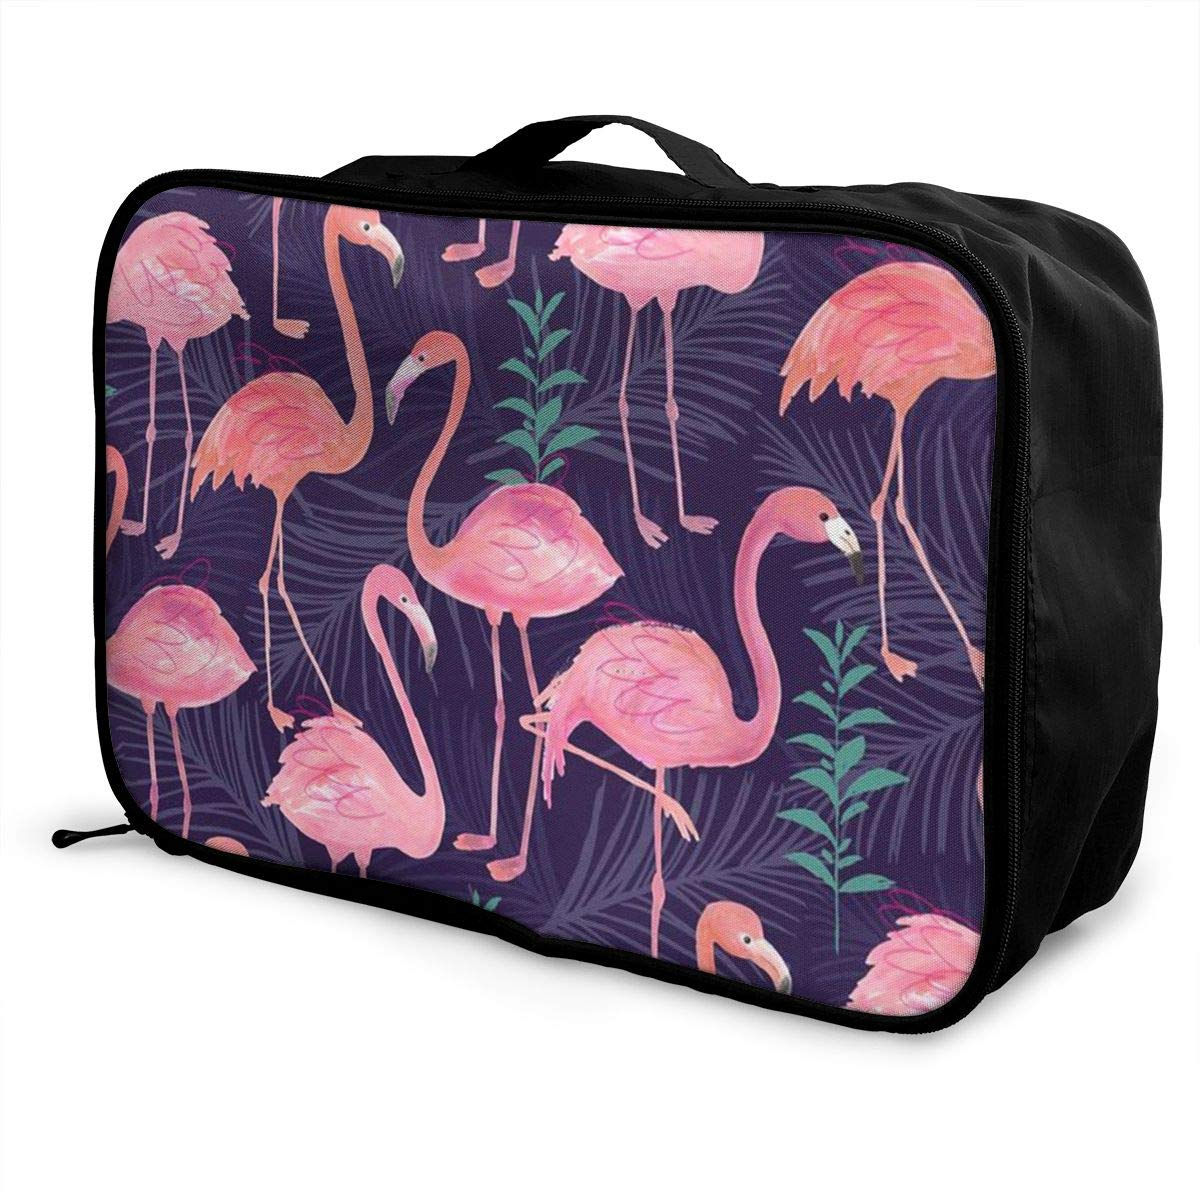 Cute Flamingo Travel Duffel Bag Waterproof Fashion Lightweight Large Capacity Portable Luggage Bag